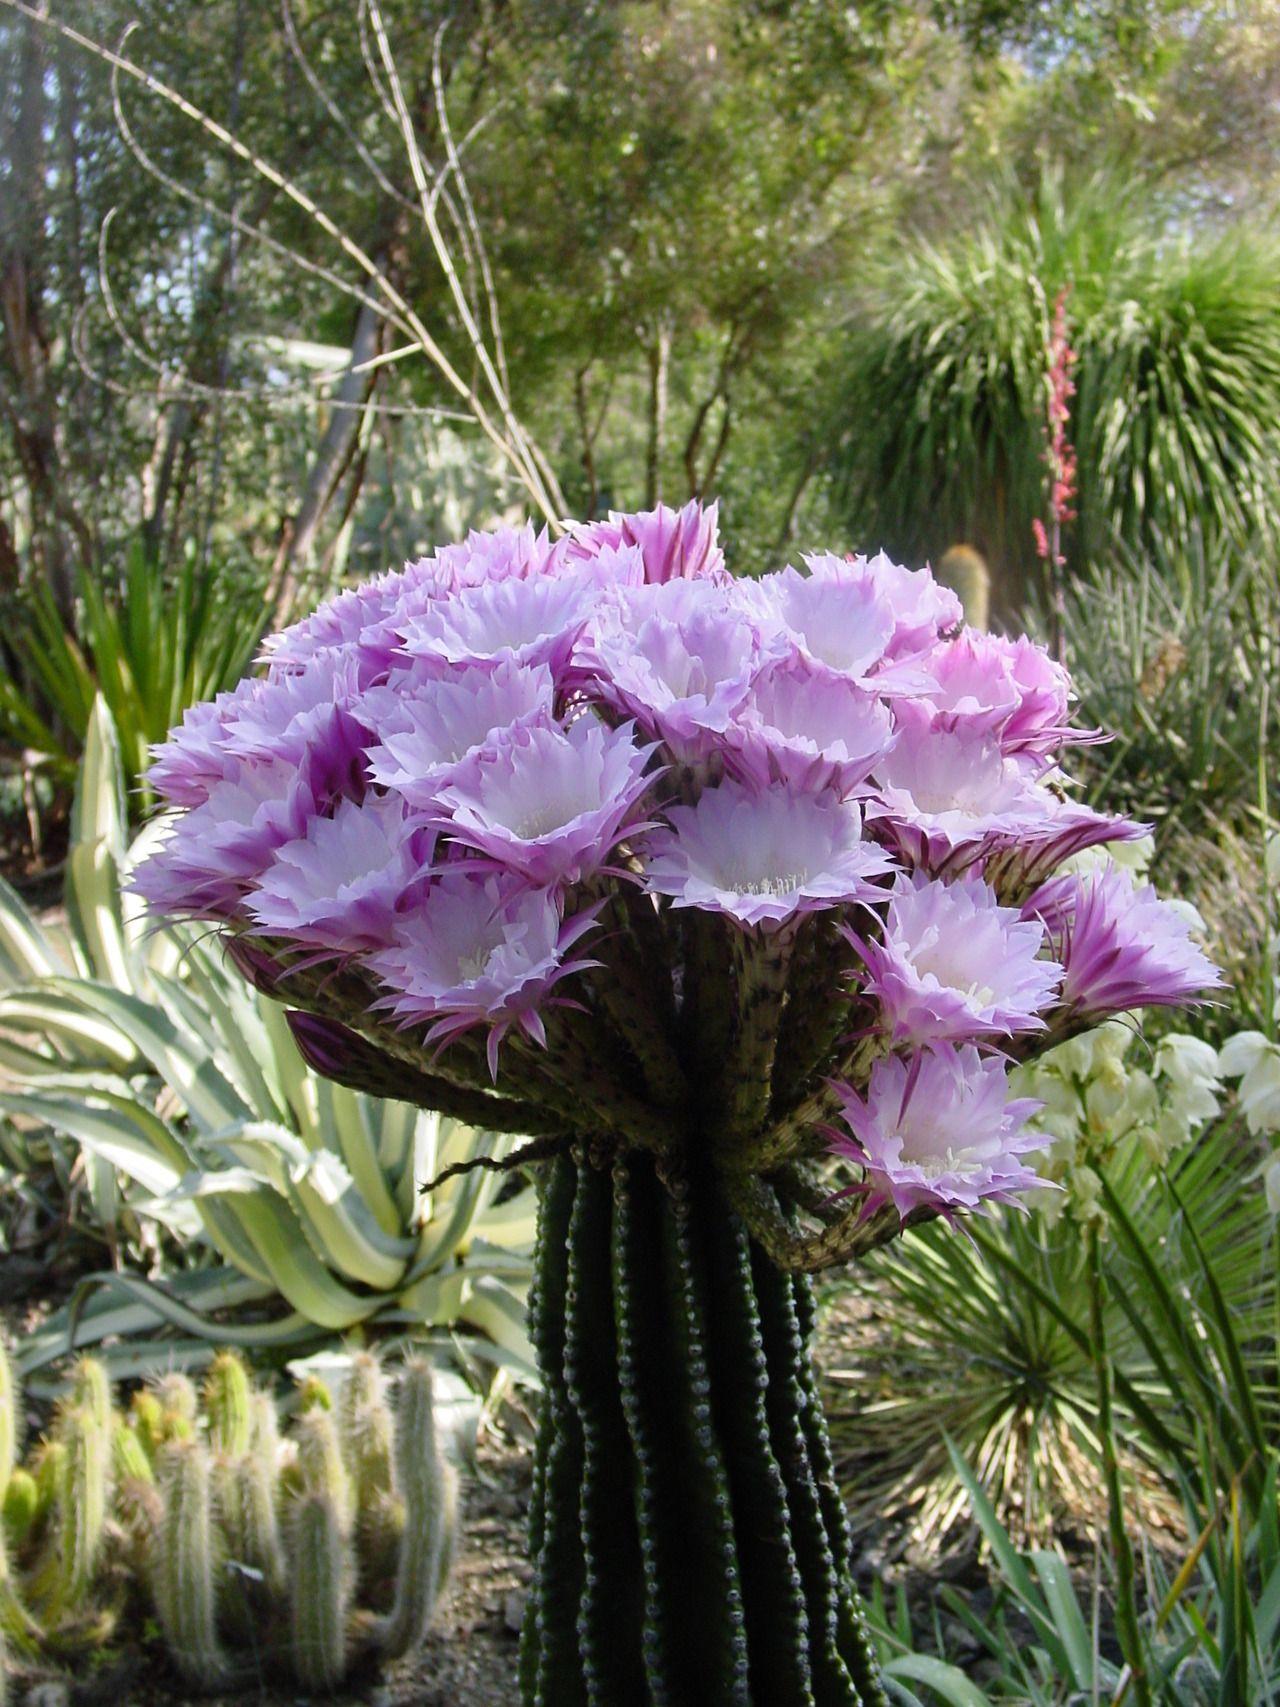 Flowers unique flowers beautiful flowers orchid cactus cactus flower - Flower Echinopsis Flower Cactus Flowerorchid Cactusflower Bedsbeautiful Flowersexotic